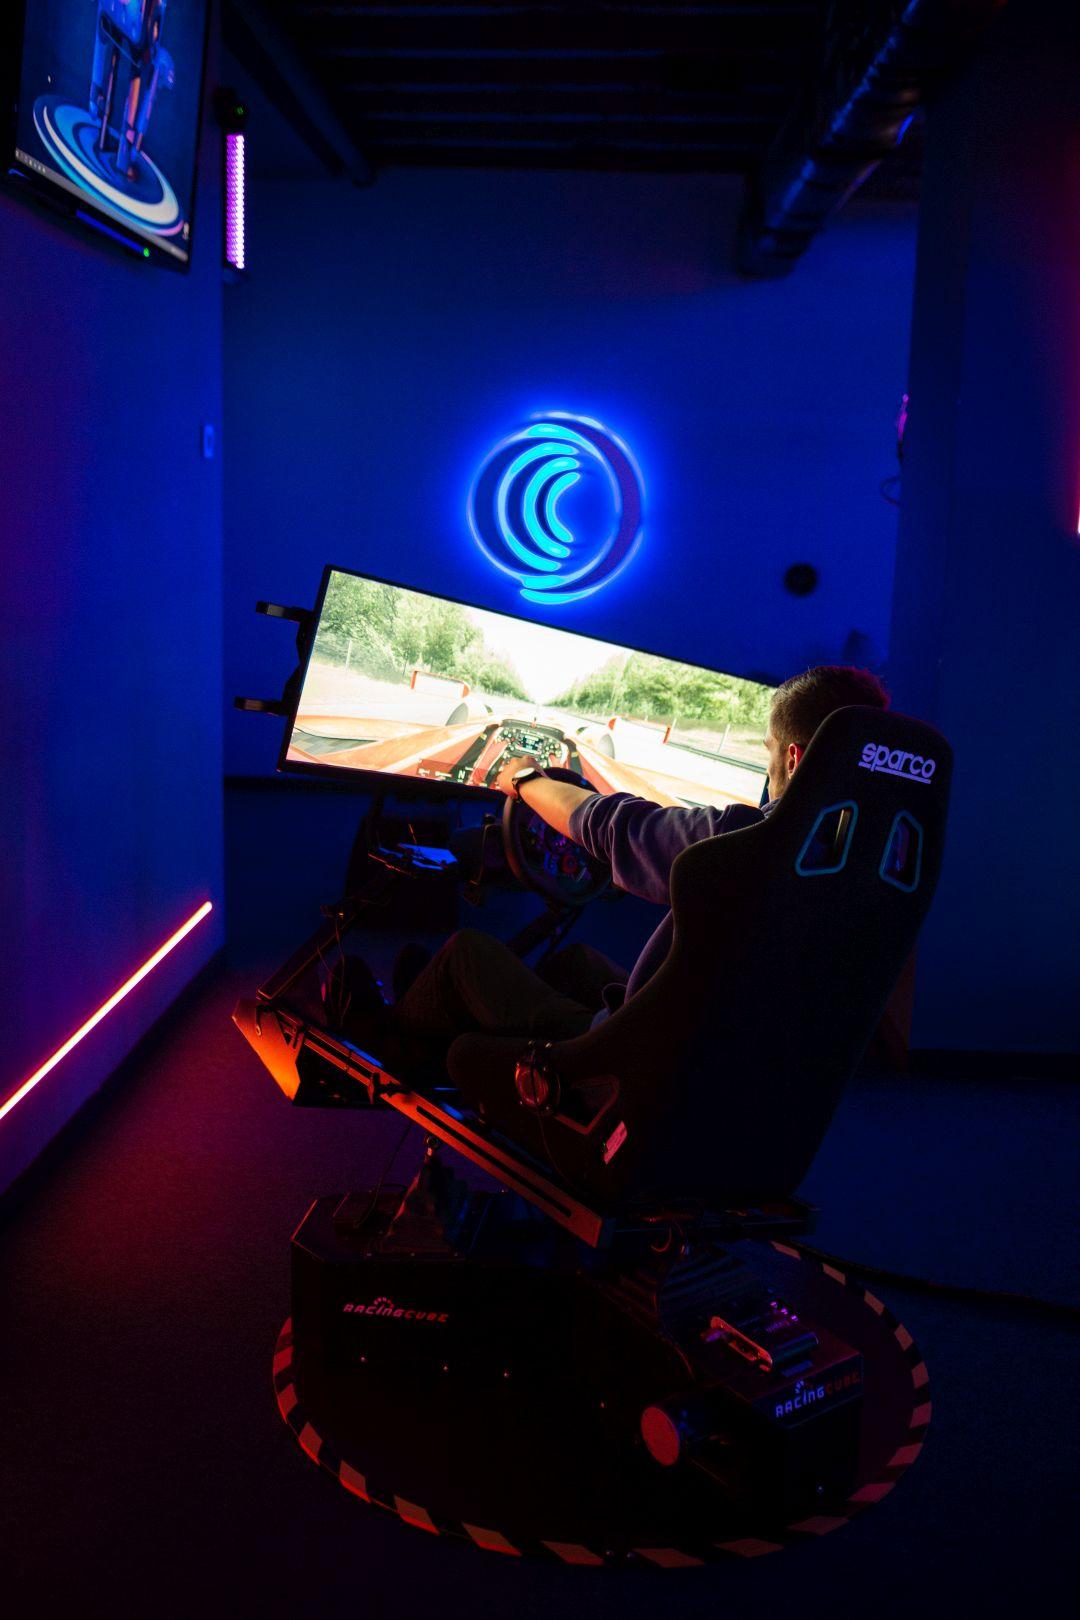 Racing Cube-Racing-Gaming-4dof-Fasetech-Portal